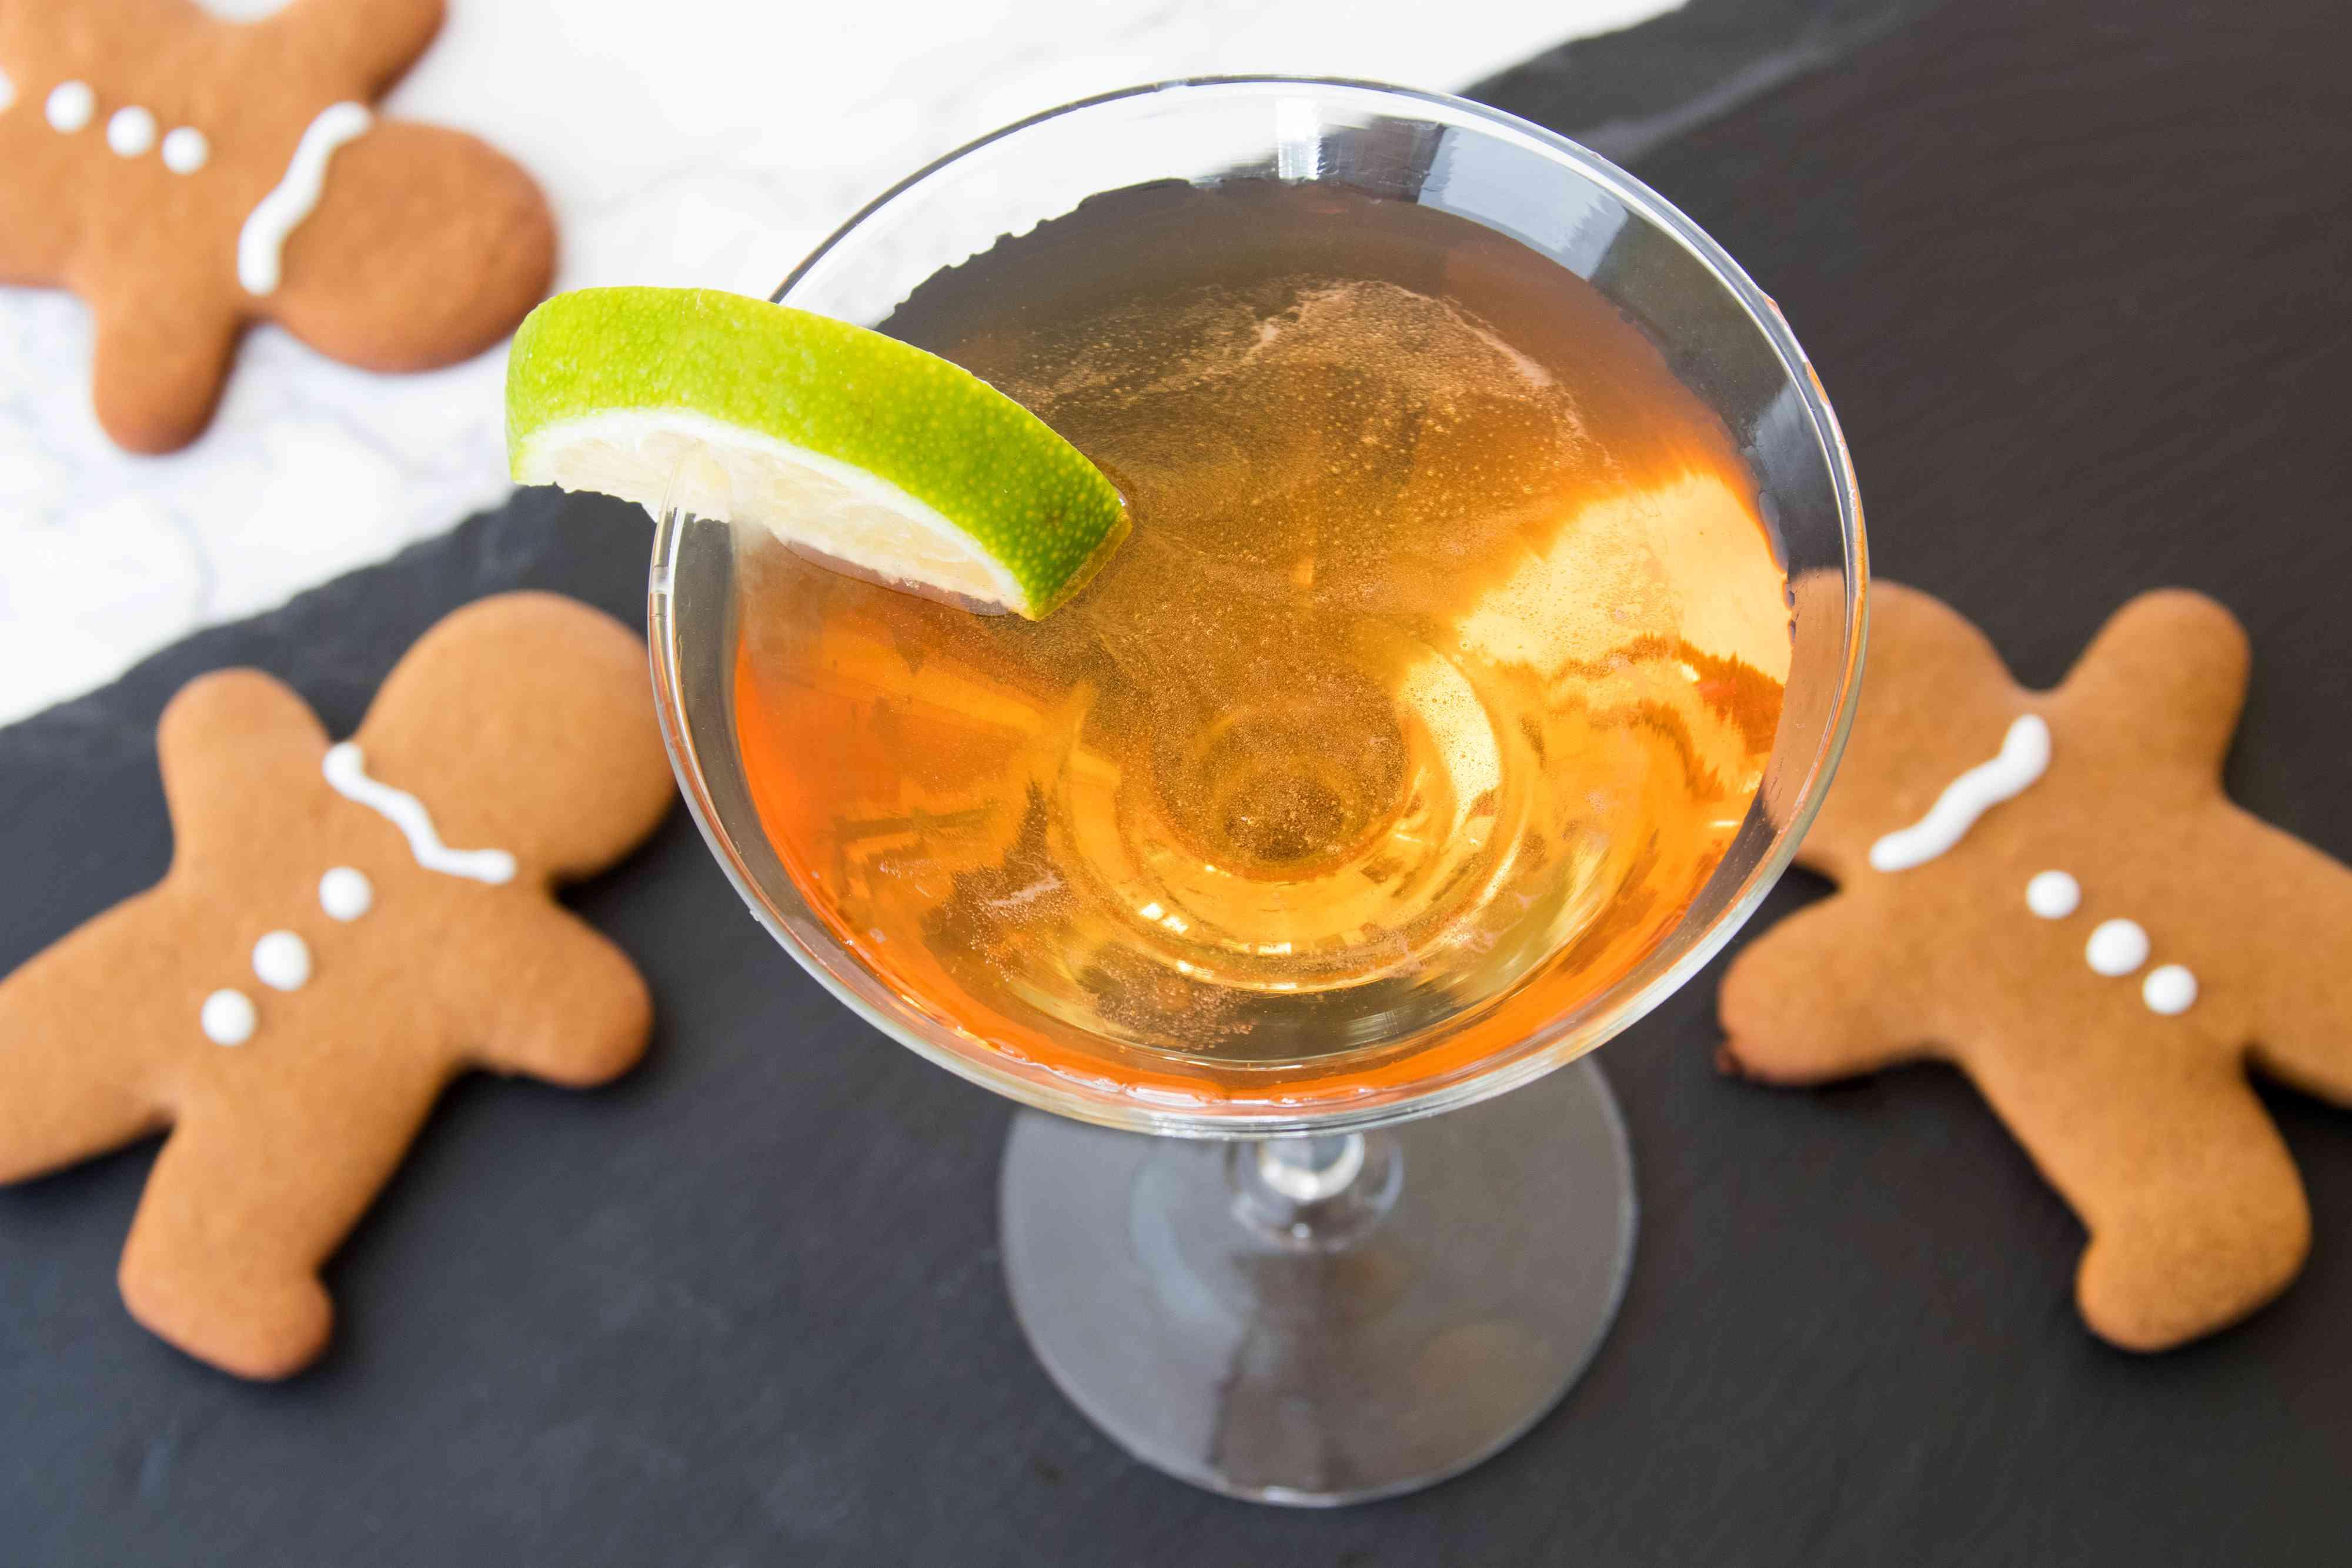 Gingerbread Man-tini Cocktail